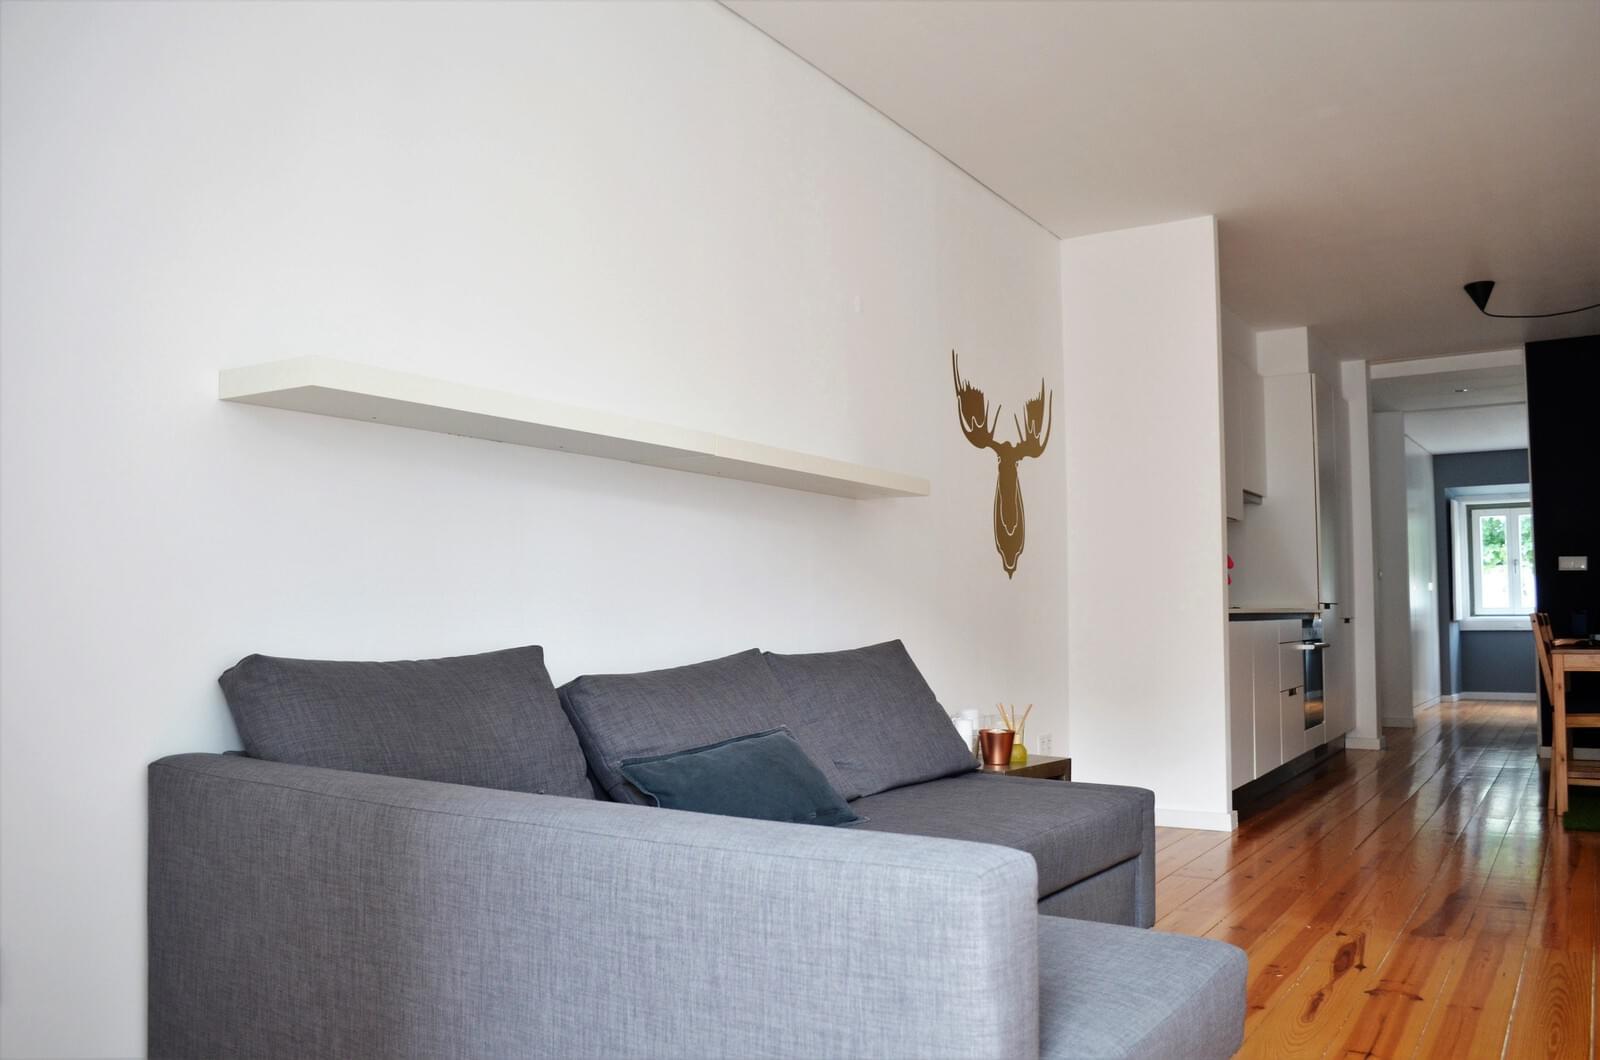 pf17785-apartamento-t1-lisboa-5a46cb18-a3ad-489a-96b4-0baeea6c7656